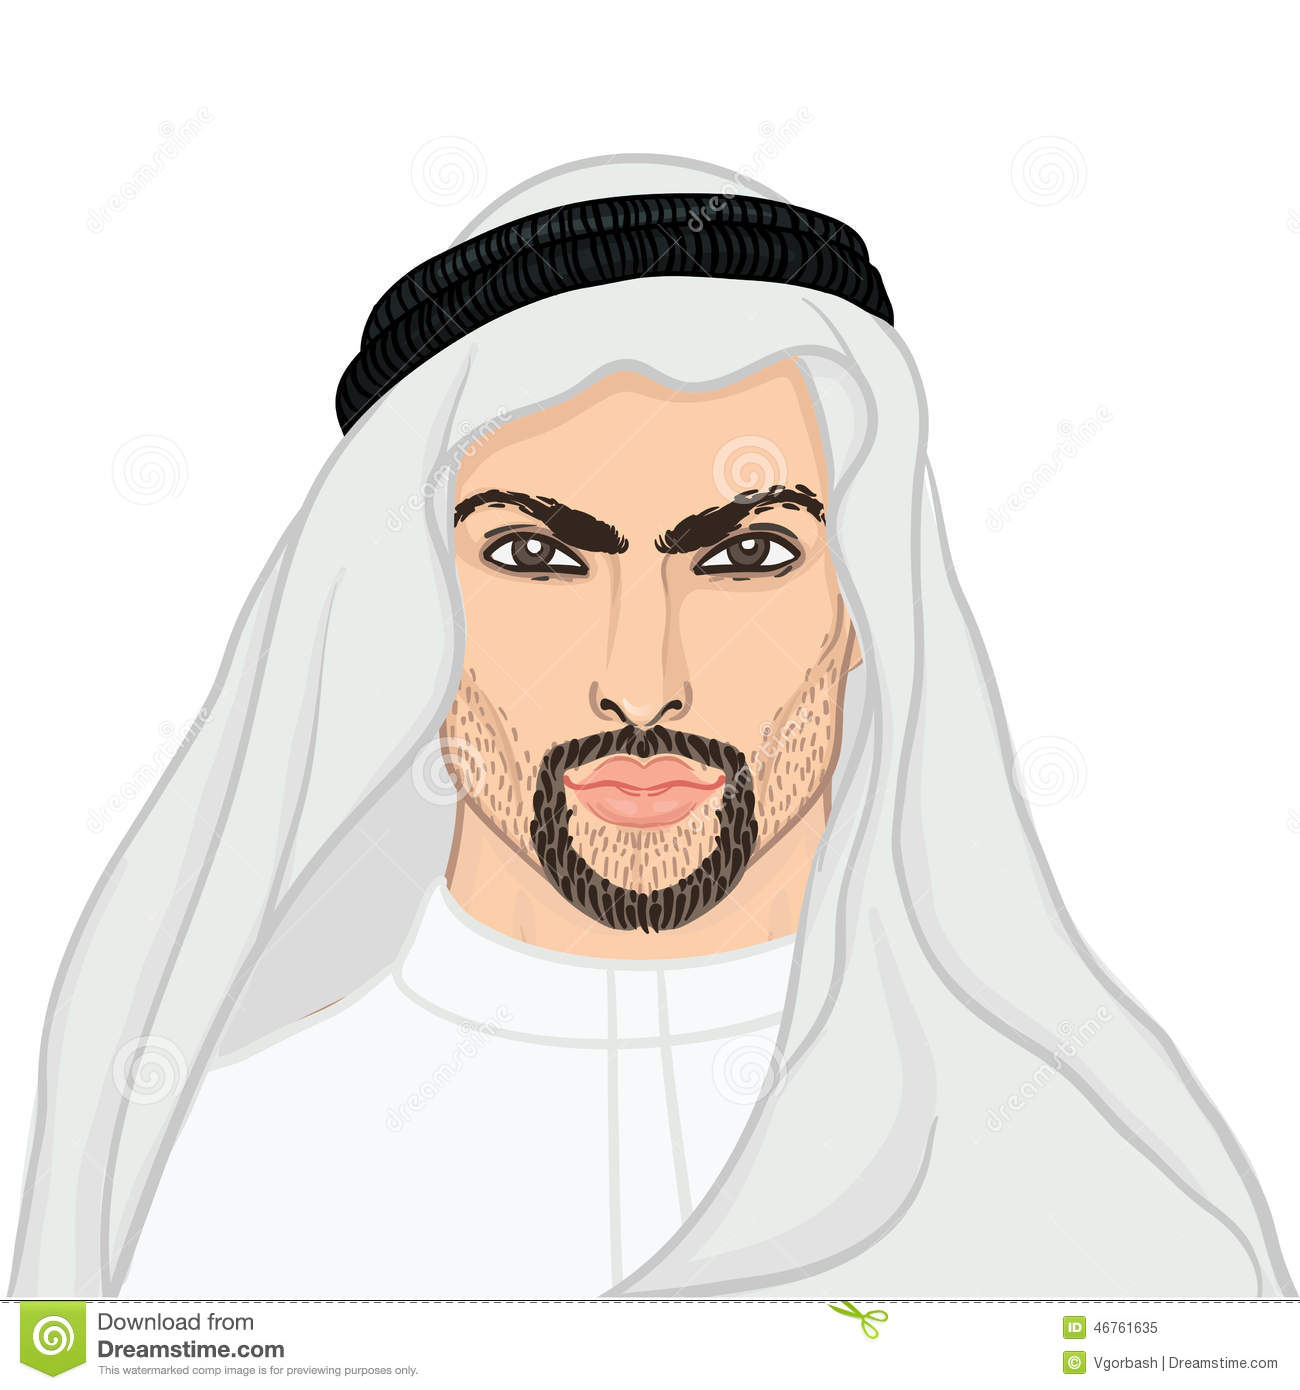 Arabic man clipart clip freeuse Vector Illustration Portrait Of A Arab Man In Keffiyeh Stock ... clip freeuse